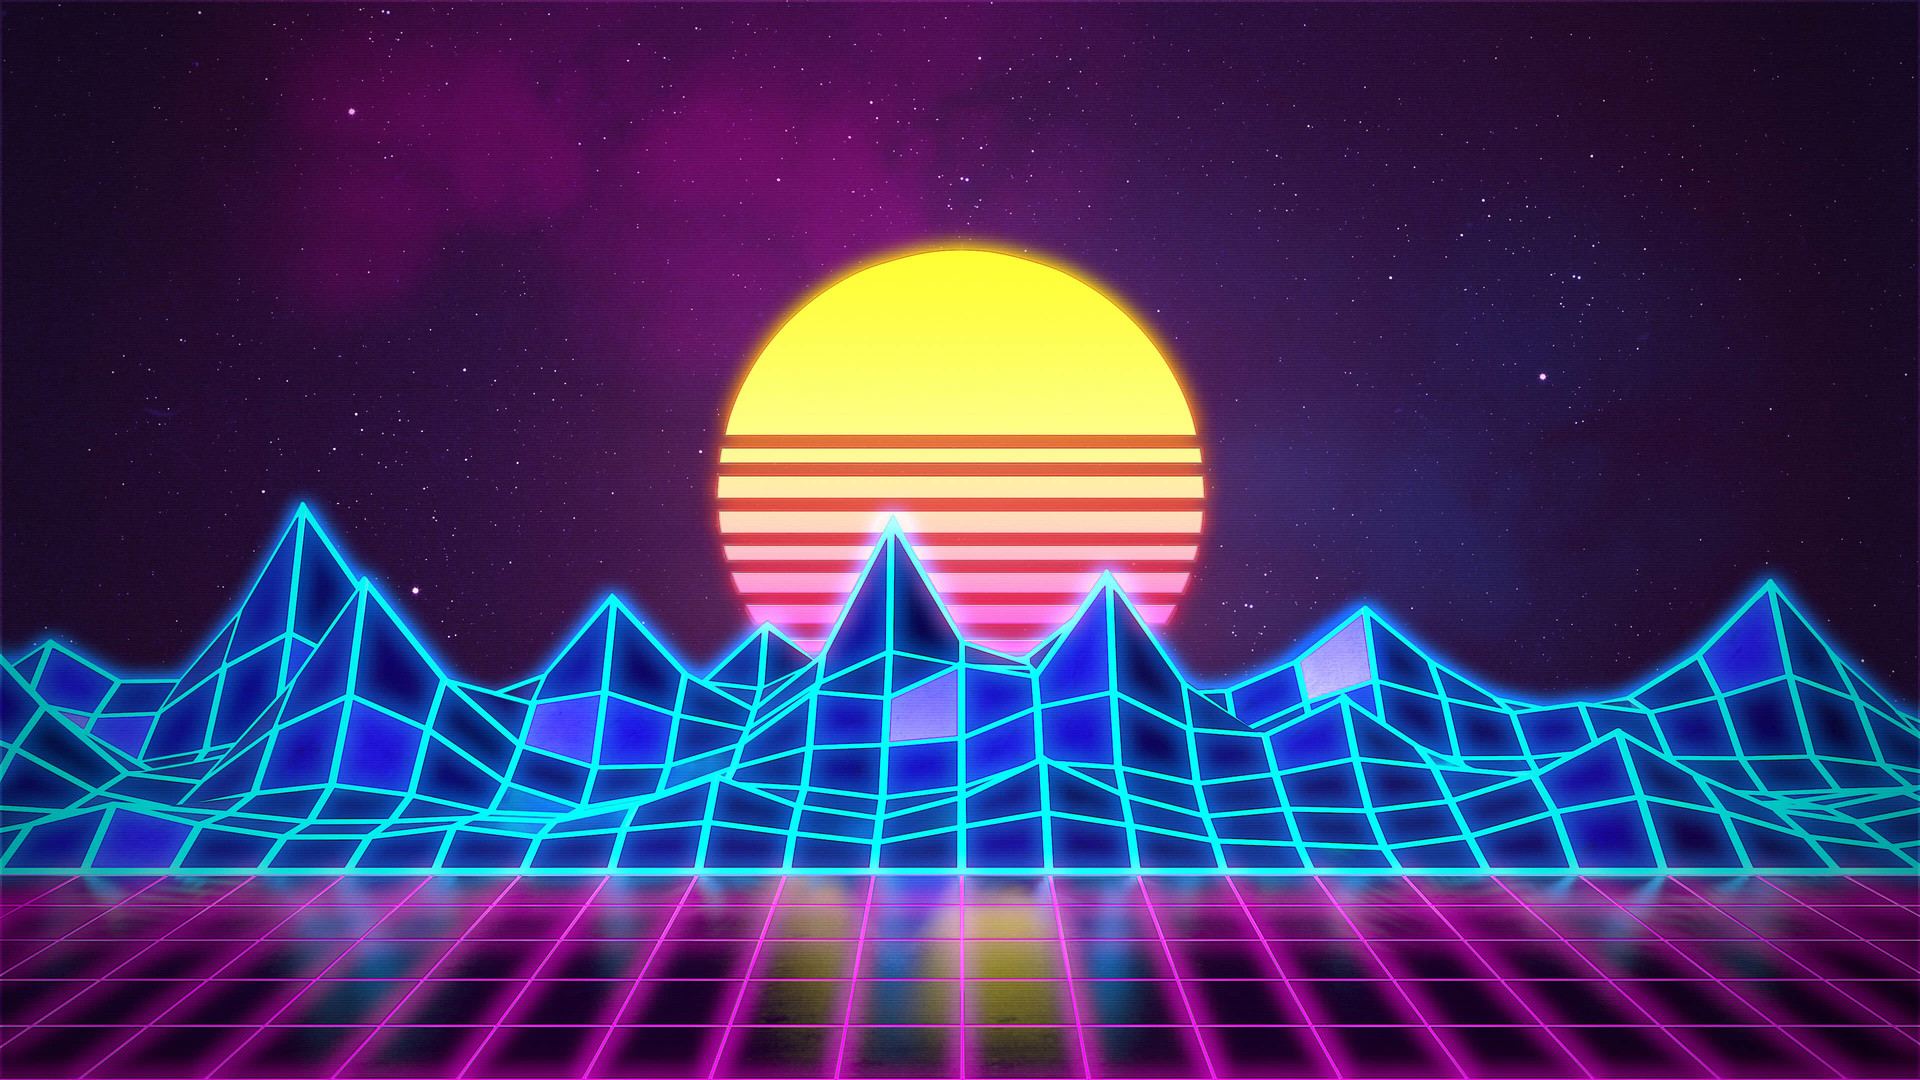 ArtStation - Synthwave – Neon 80's – Background, Rafaël De Jongh